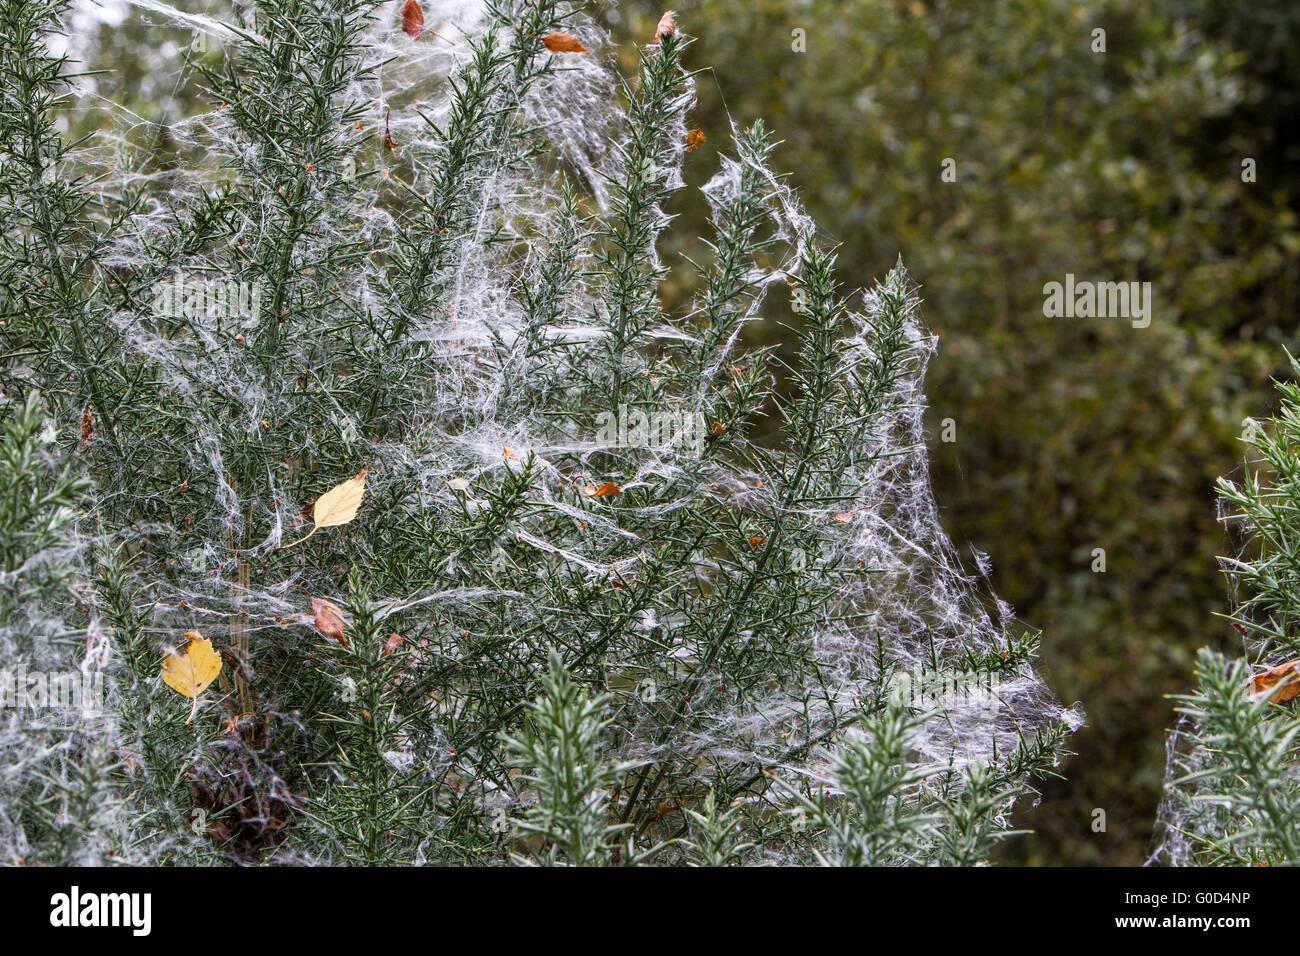 Spiders webs through pine needles Gartmorn forest Scotland - Stock Image